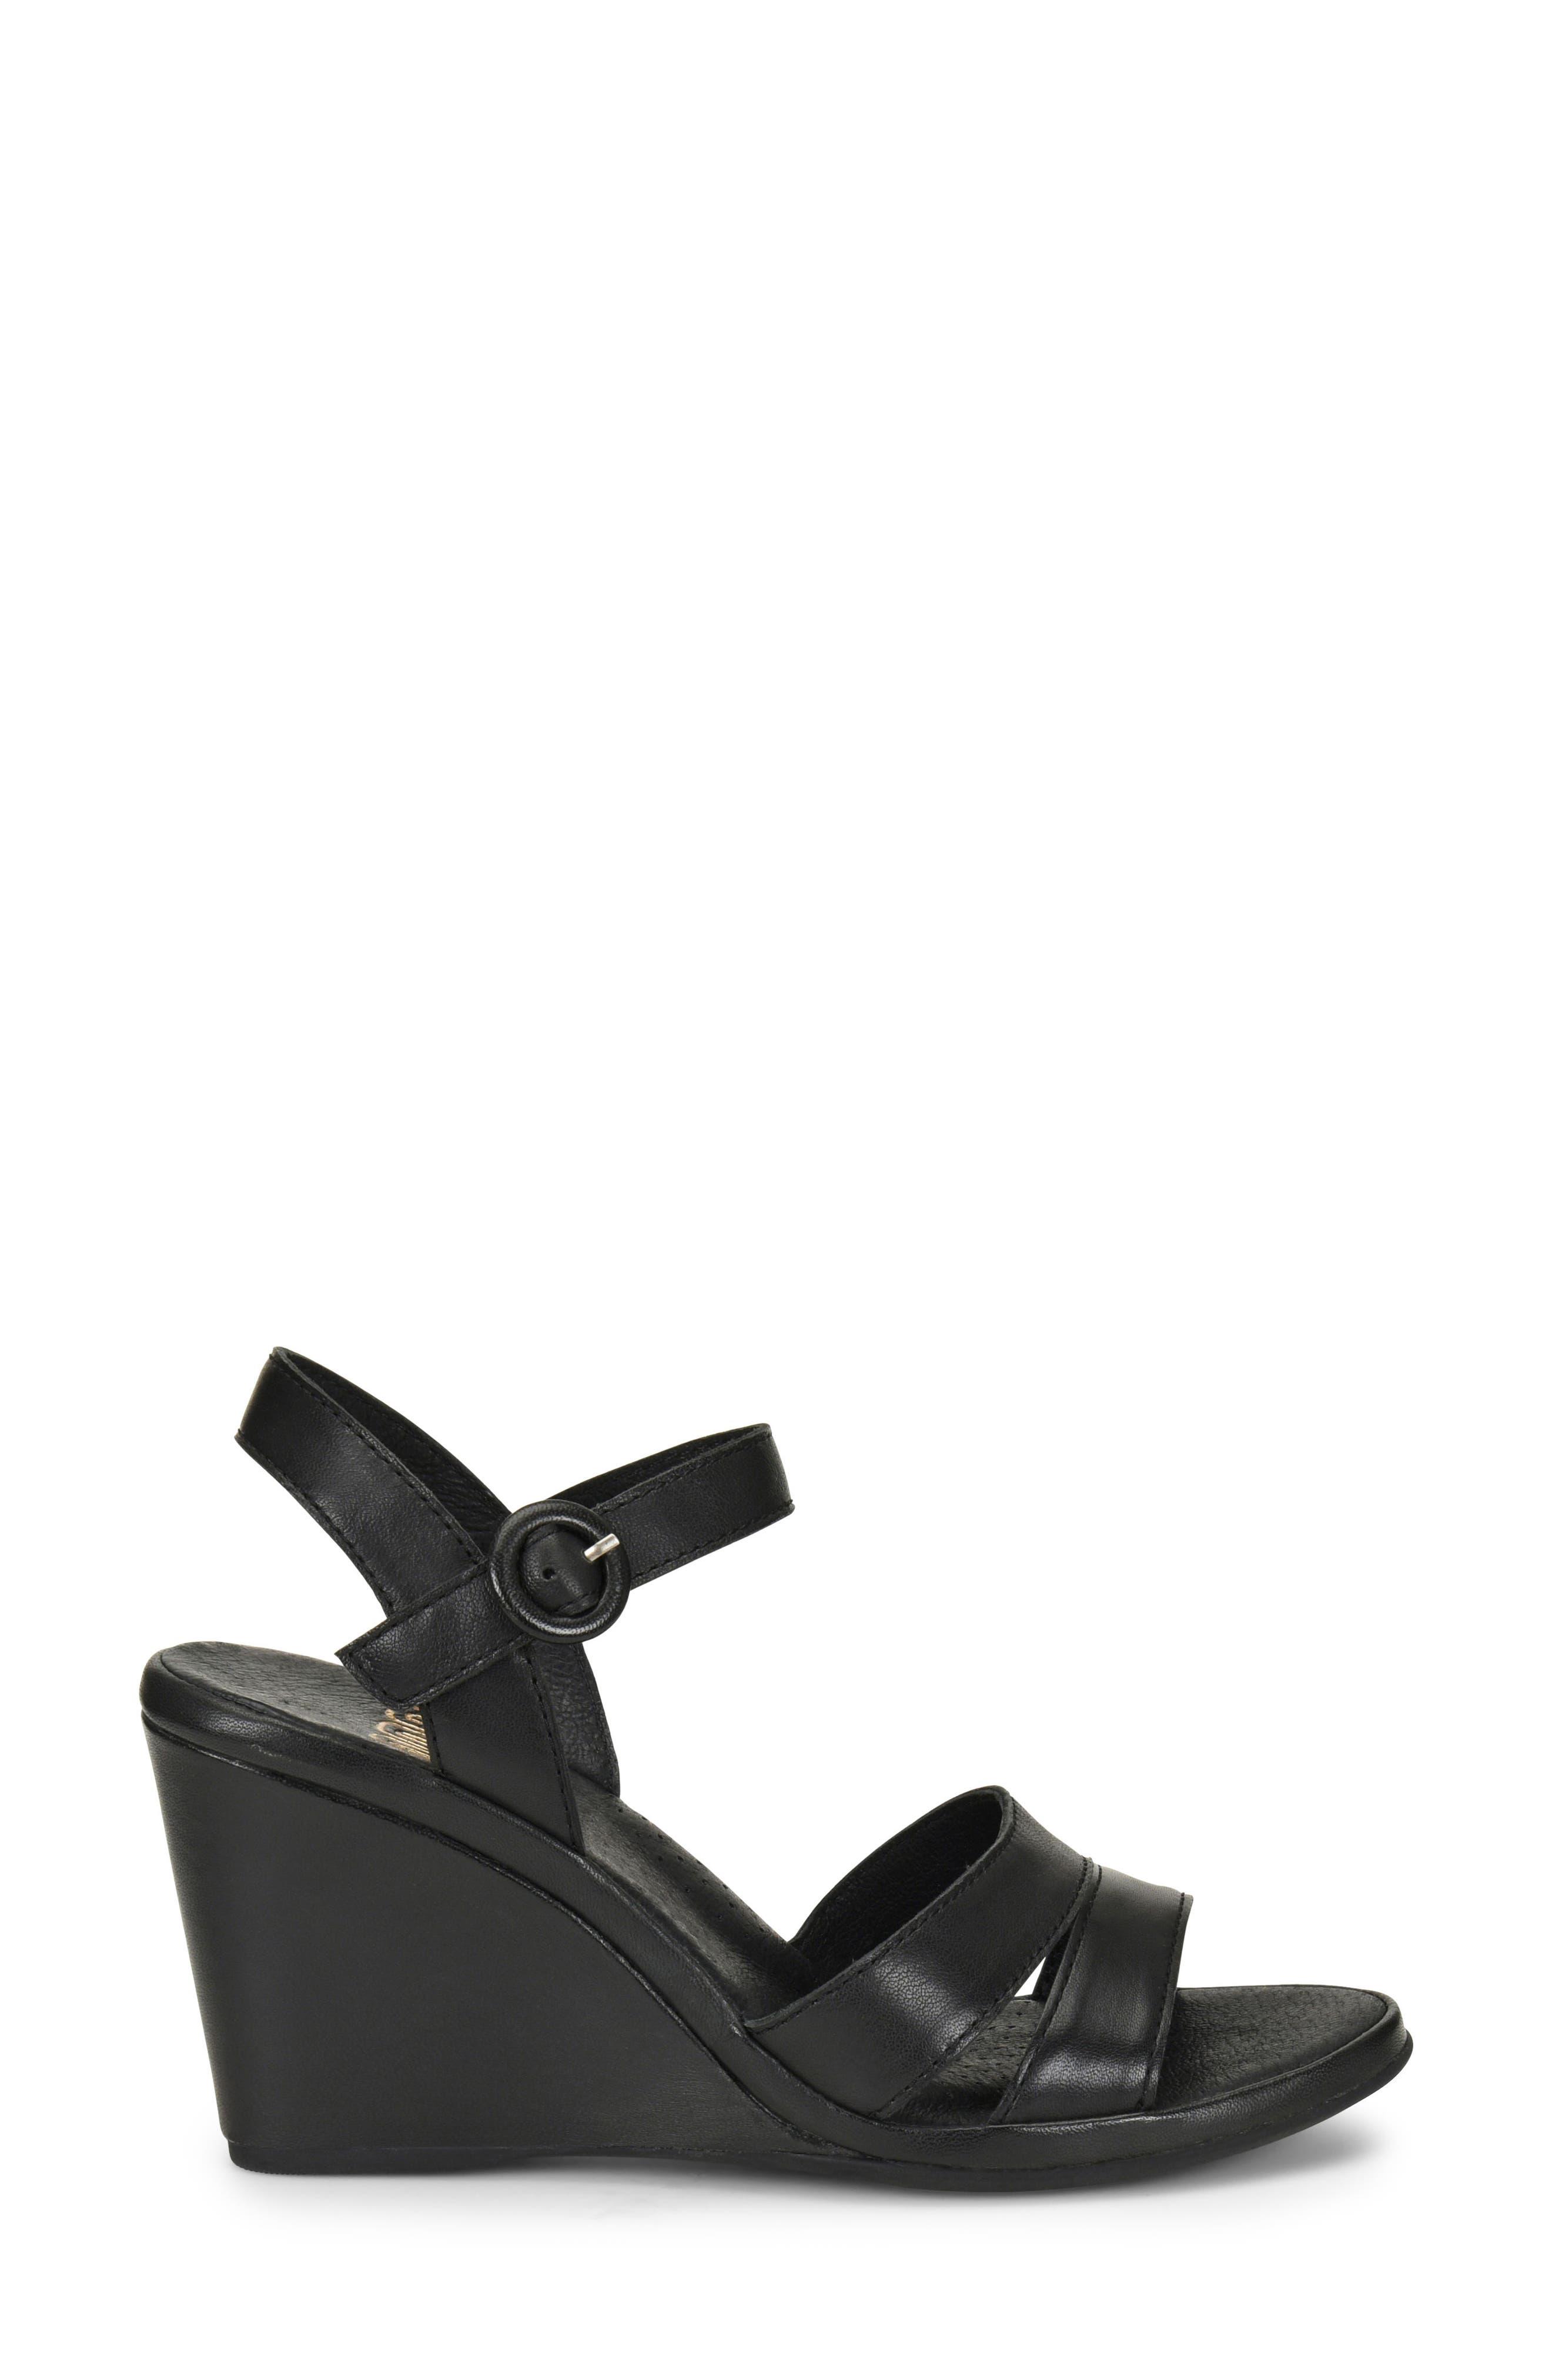 Hydro Wedge Sandal,                             Alternate thumbnail 4, color,                             Black Leather